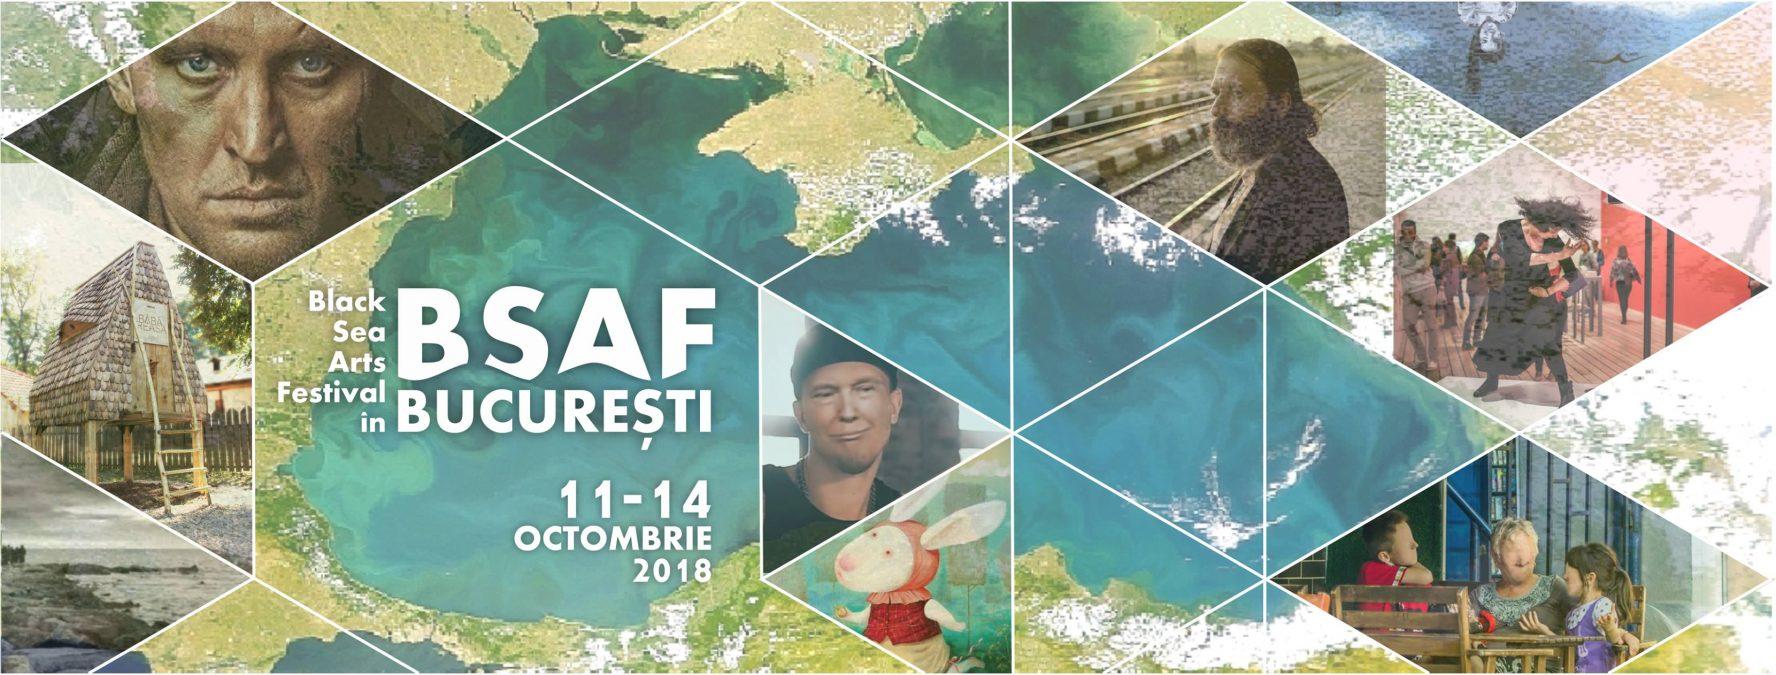 black sea arts festival